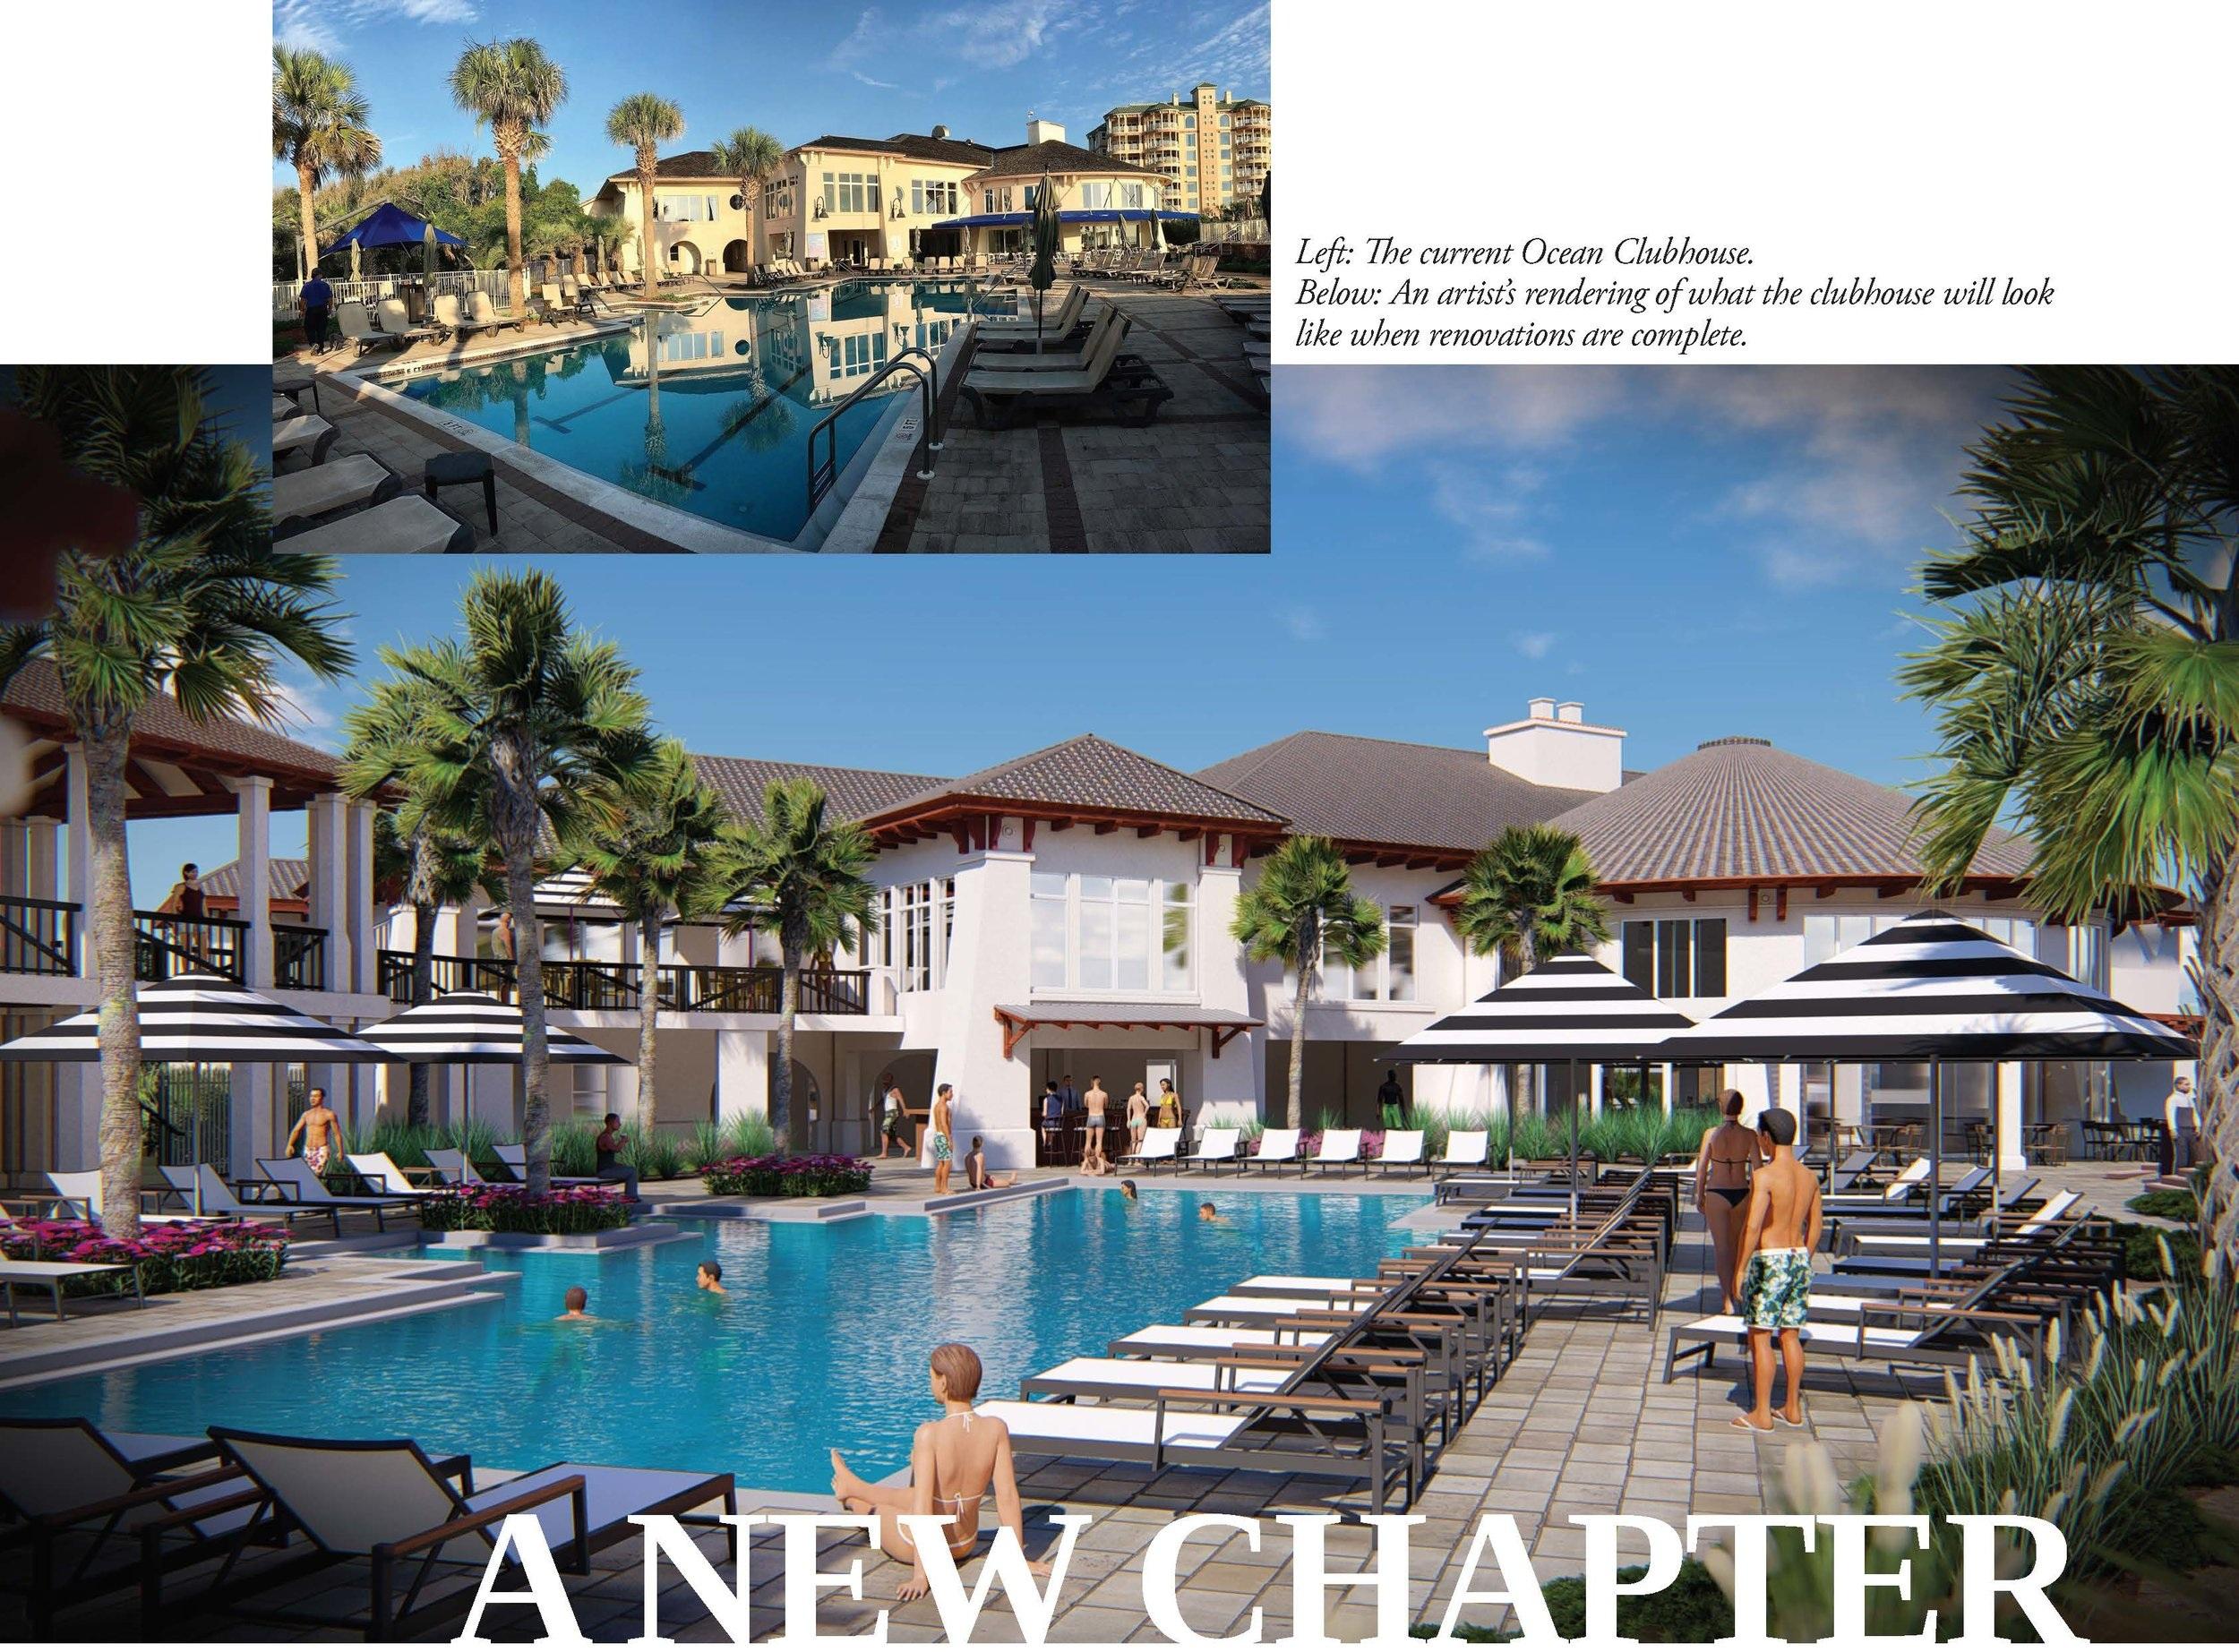 20190730_Amelia+Islander+Magazine_Amelia+Island+Club+Renovation_Page_1.jpg